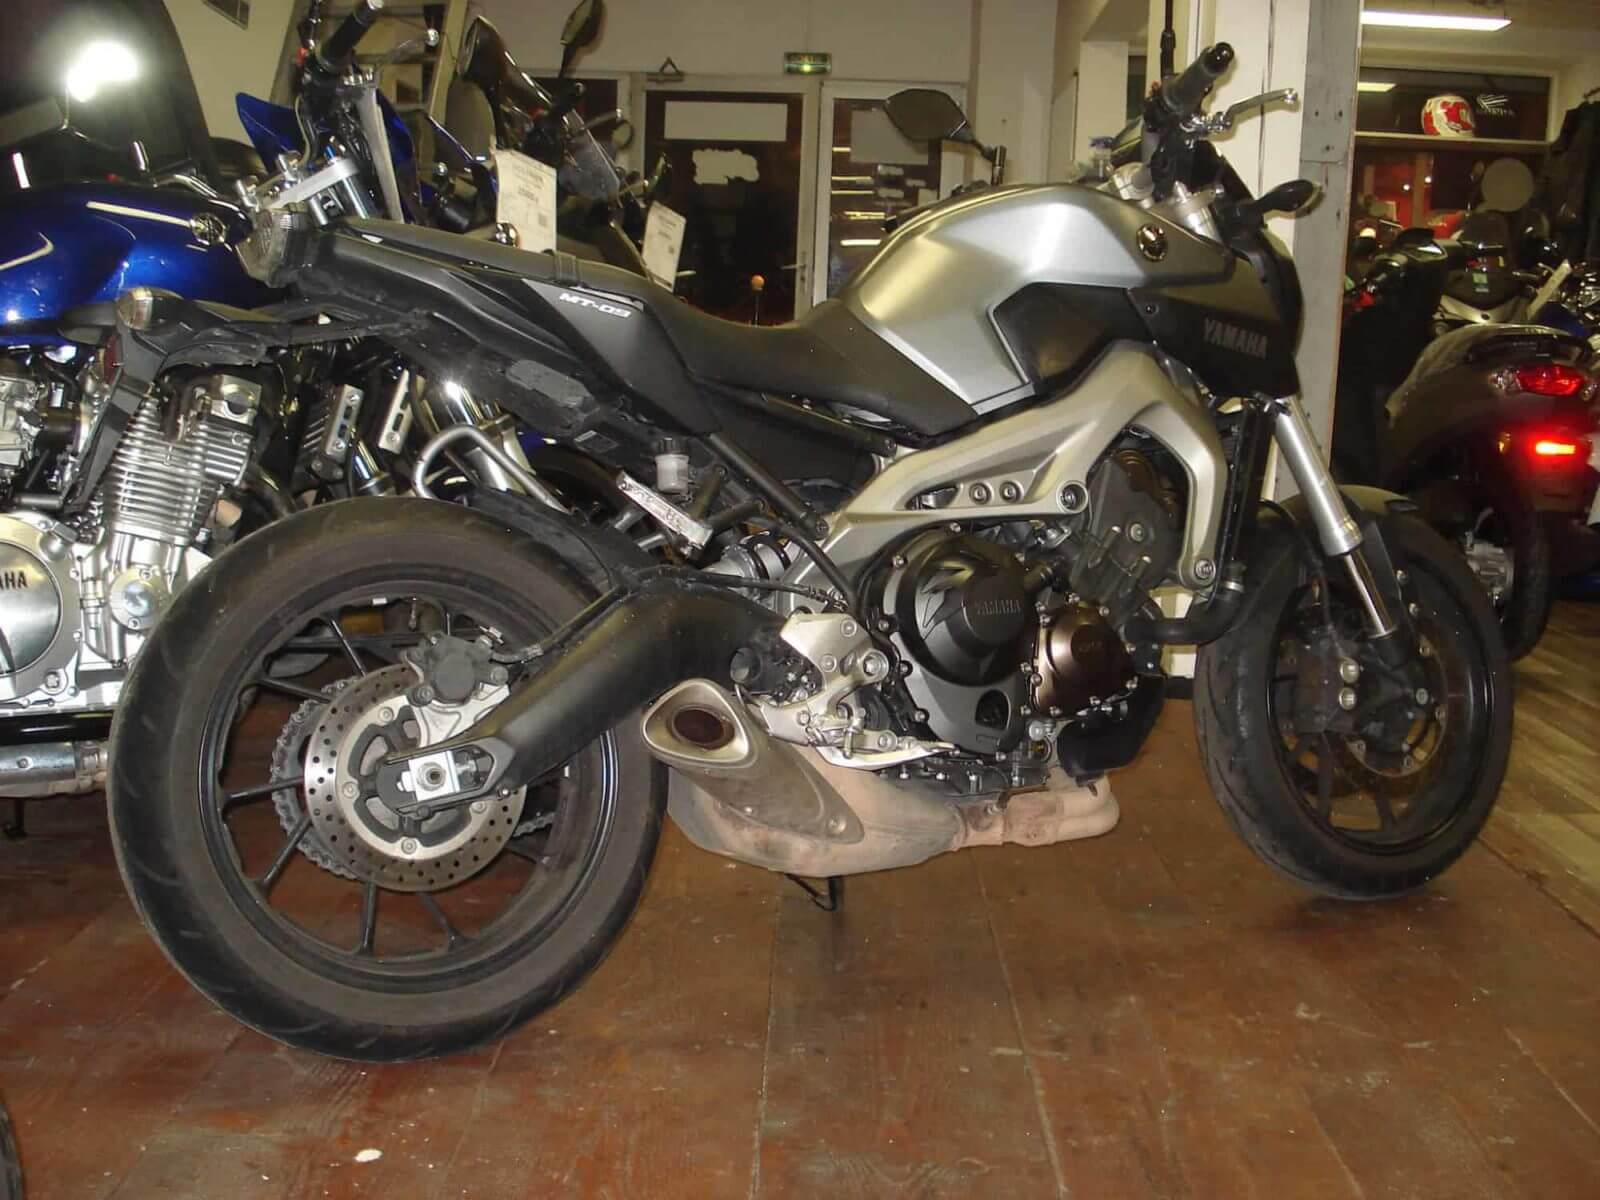 Vendu ! Yamaha MT09 – 5500€